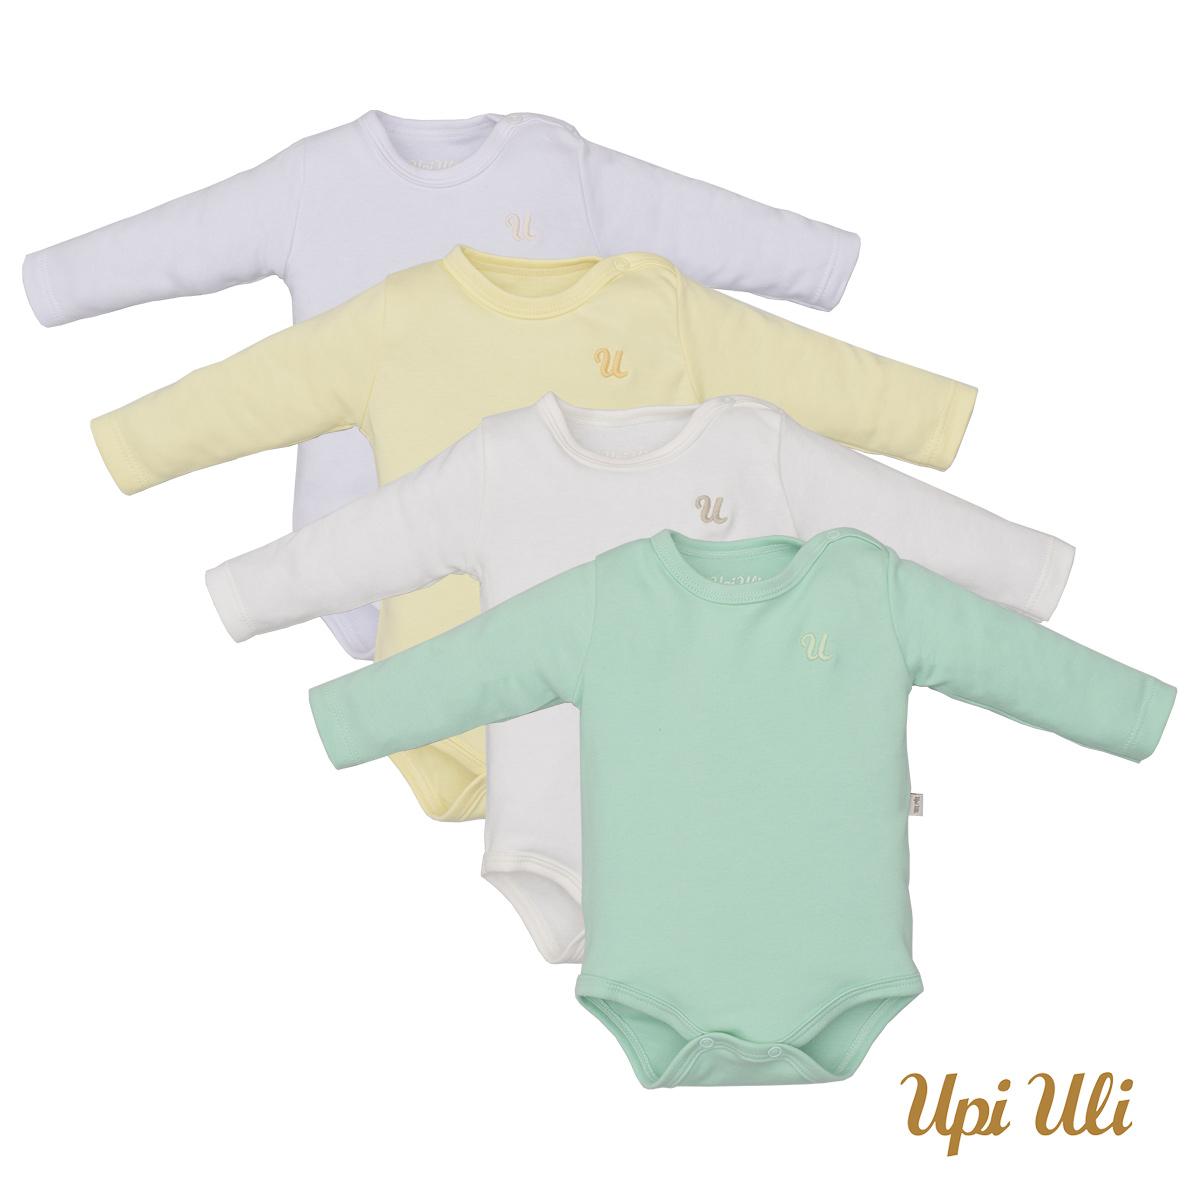 Kit bebê Body Manga Longa 4 Peças Unissex - Marfim, Verde, Amarelo e Branco